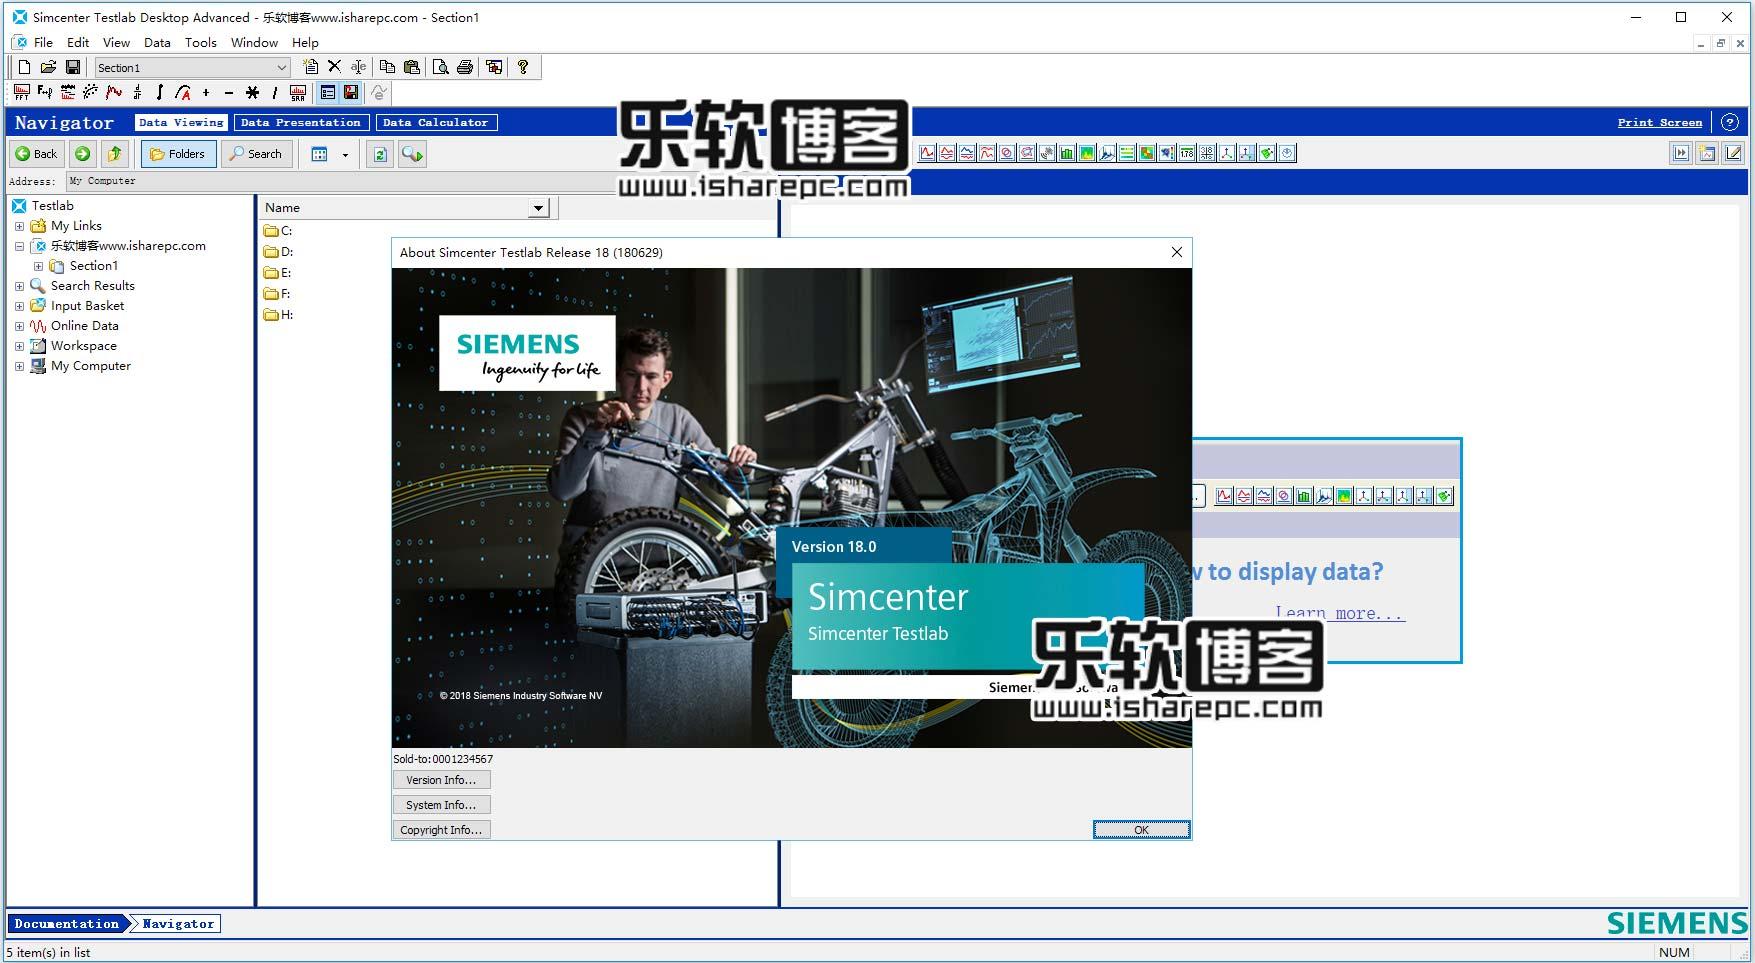 Siemens Simcenter TestLab 18.0破解版